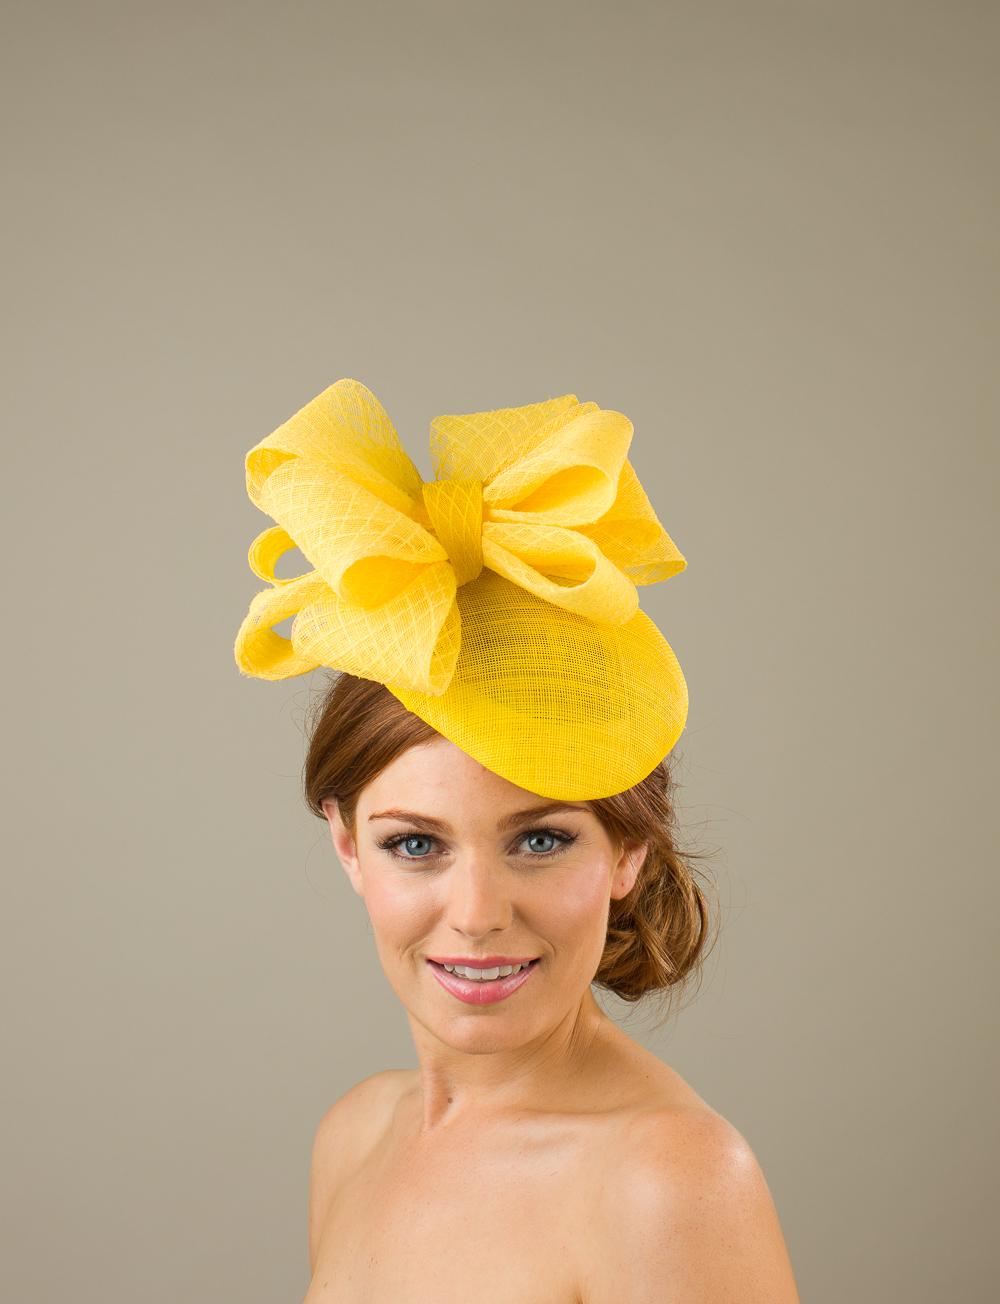 Devises Pillbox hat by hostie hats